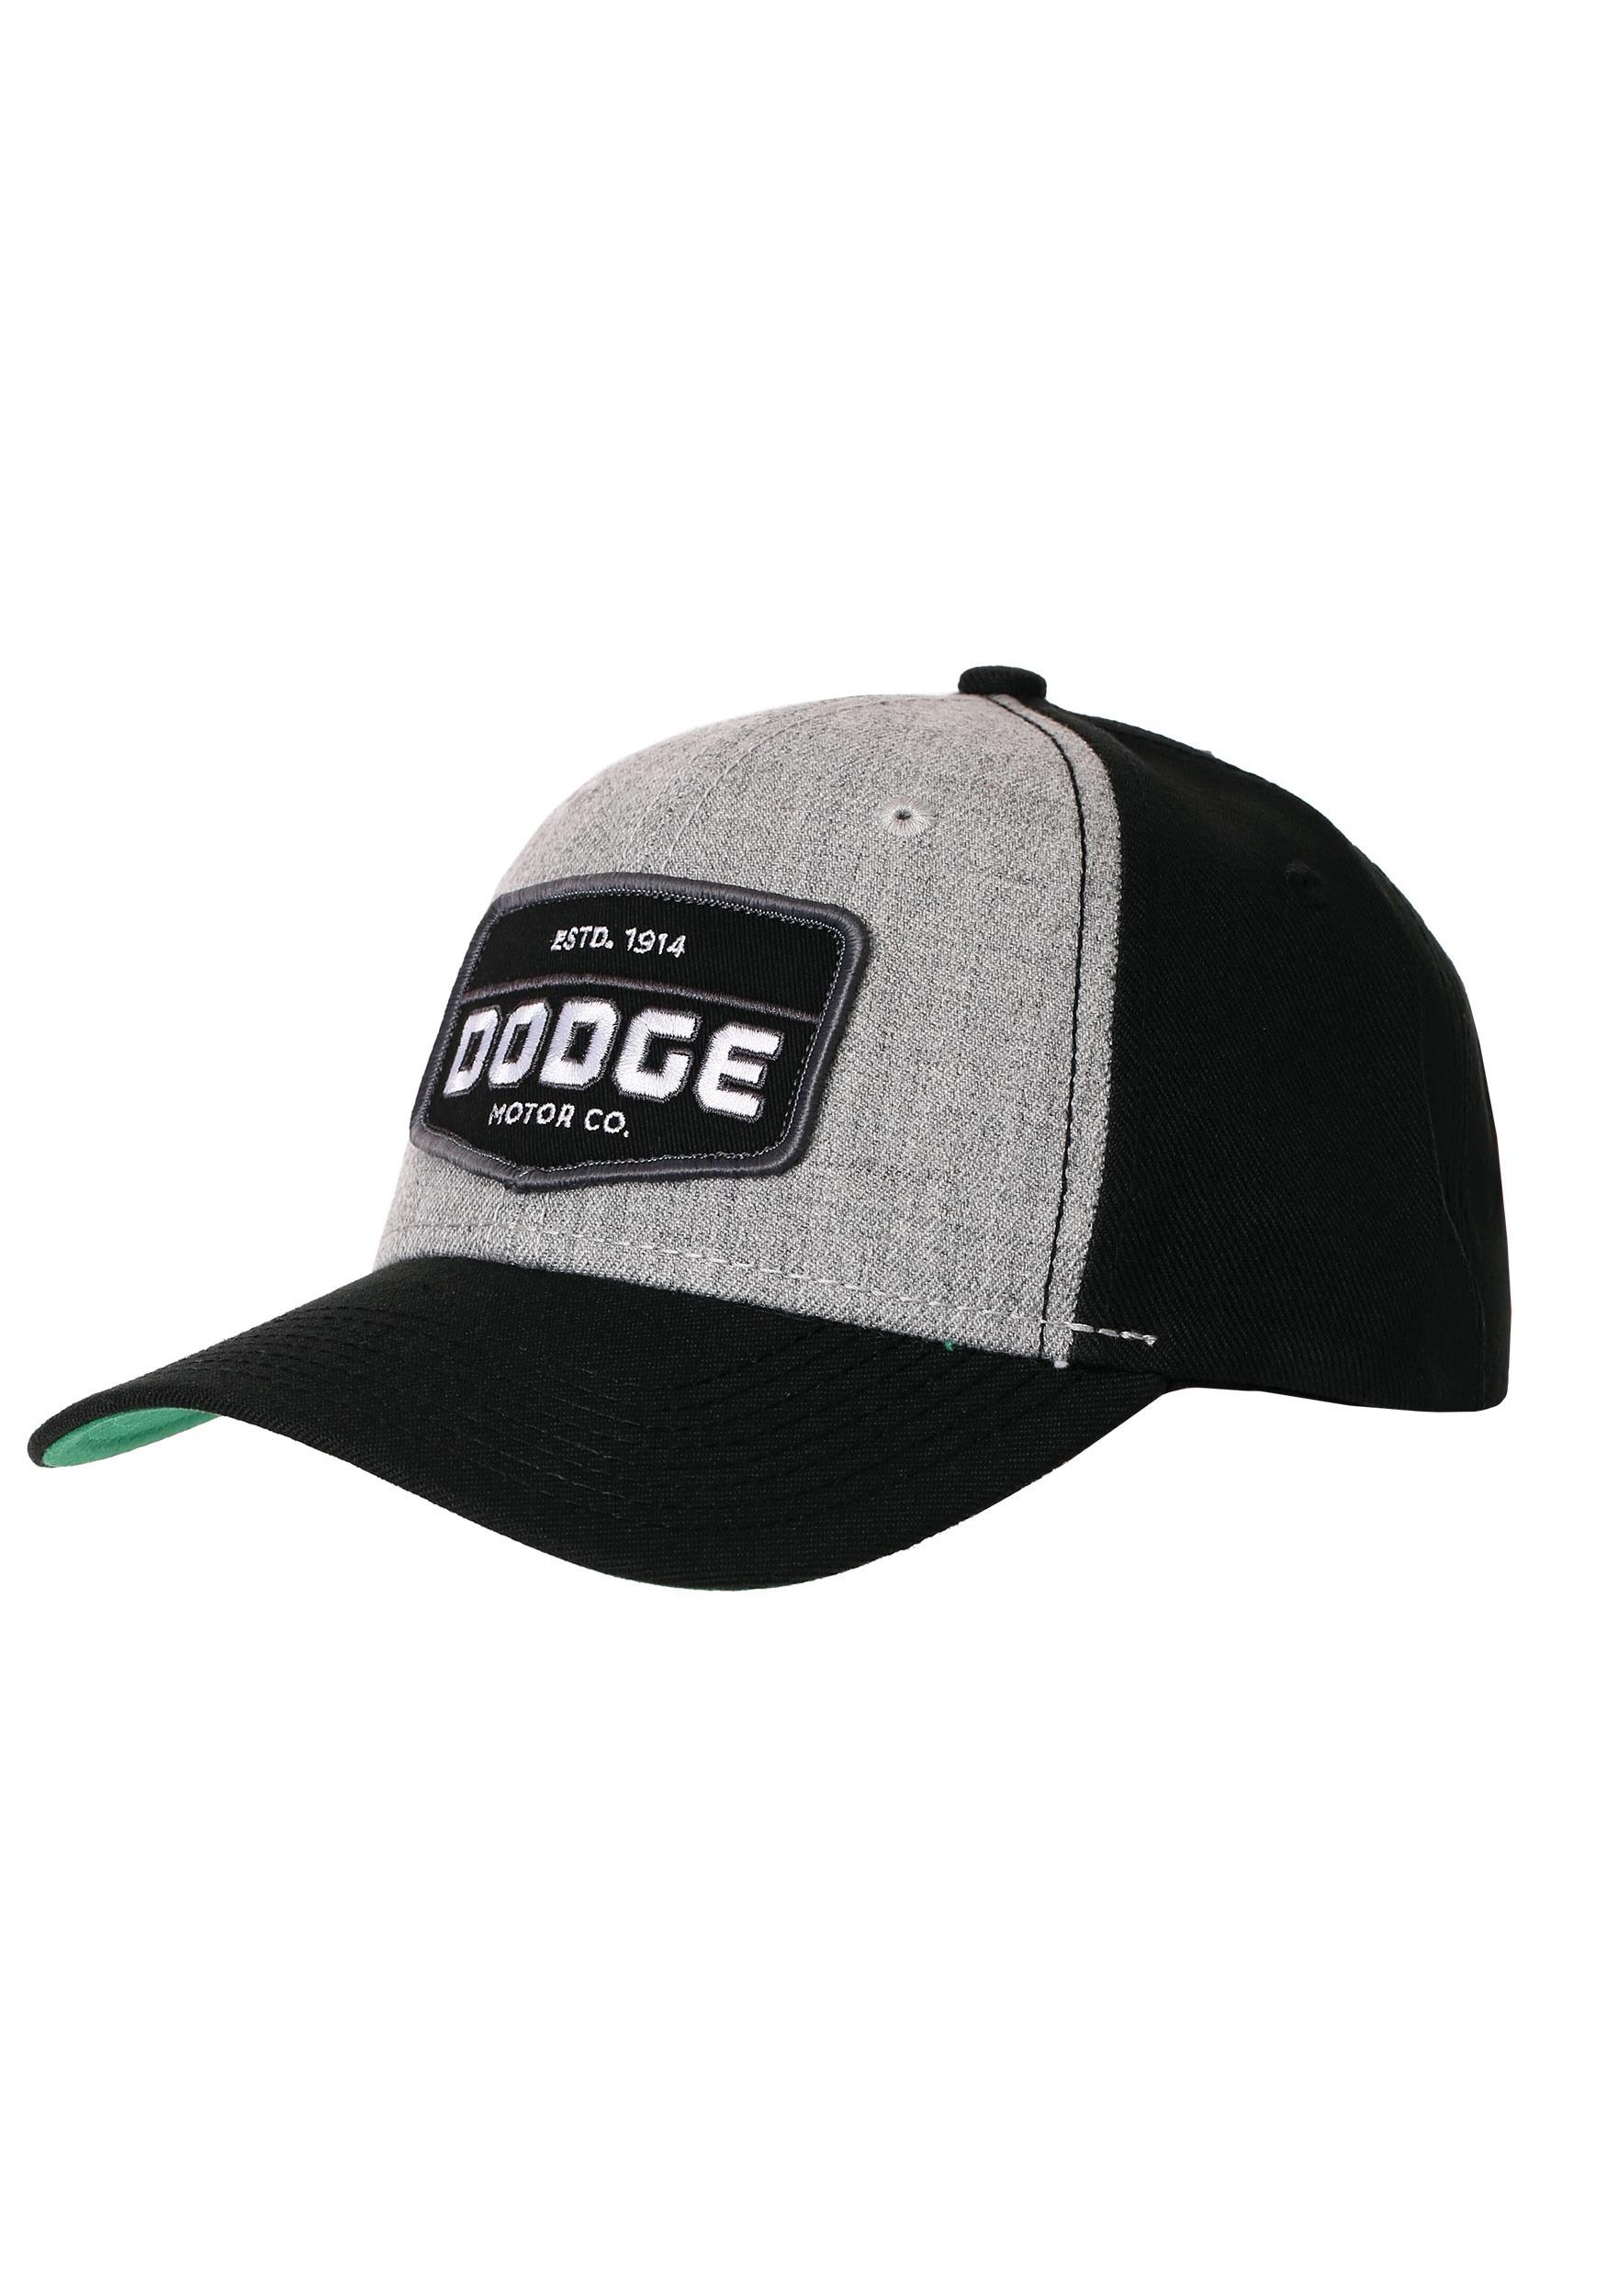 2d8305056 Dodge Motor Co. Grey/Black Wool Blend Baseball Snapback Hat